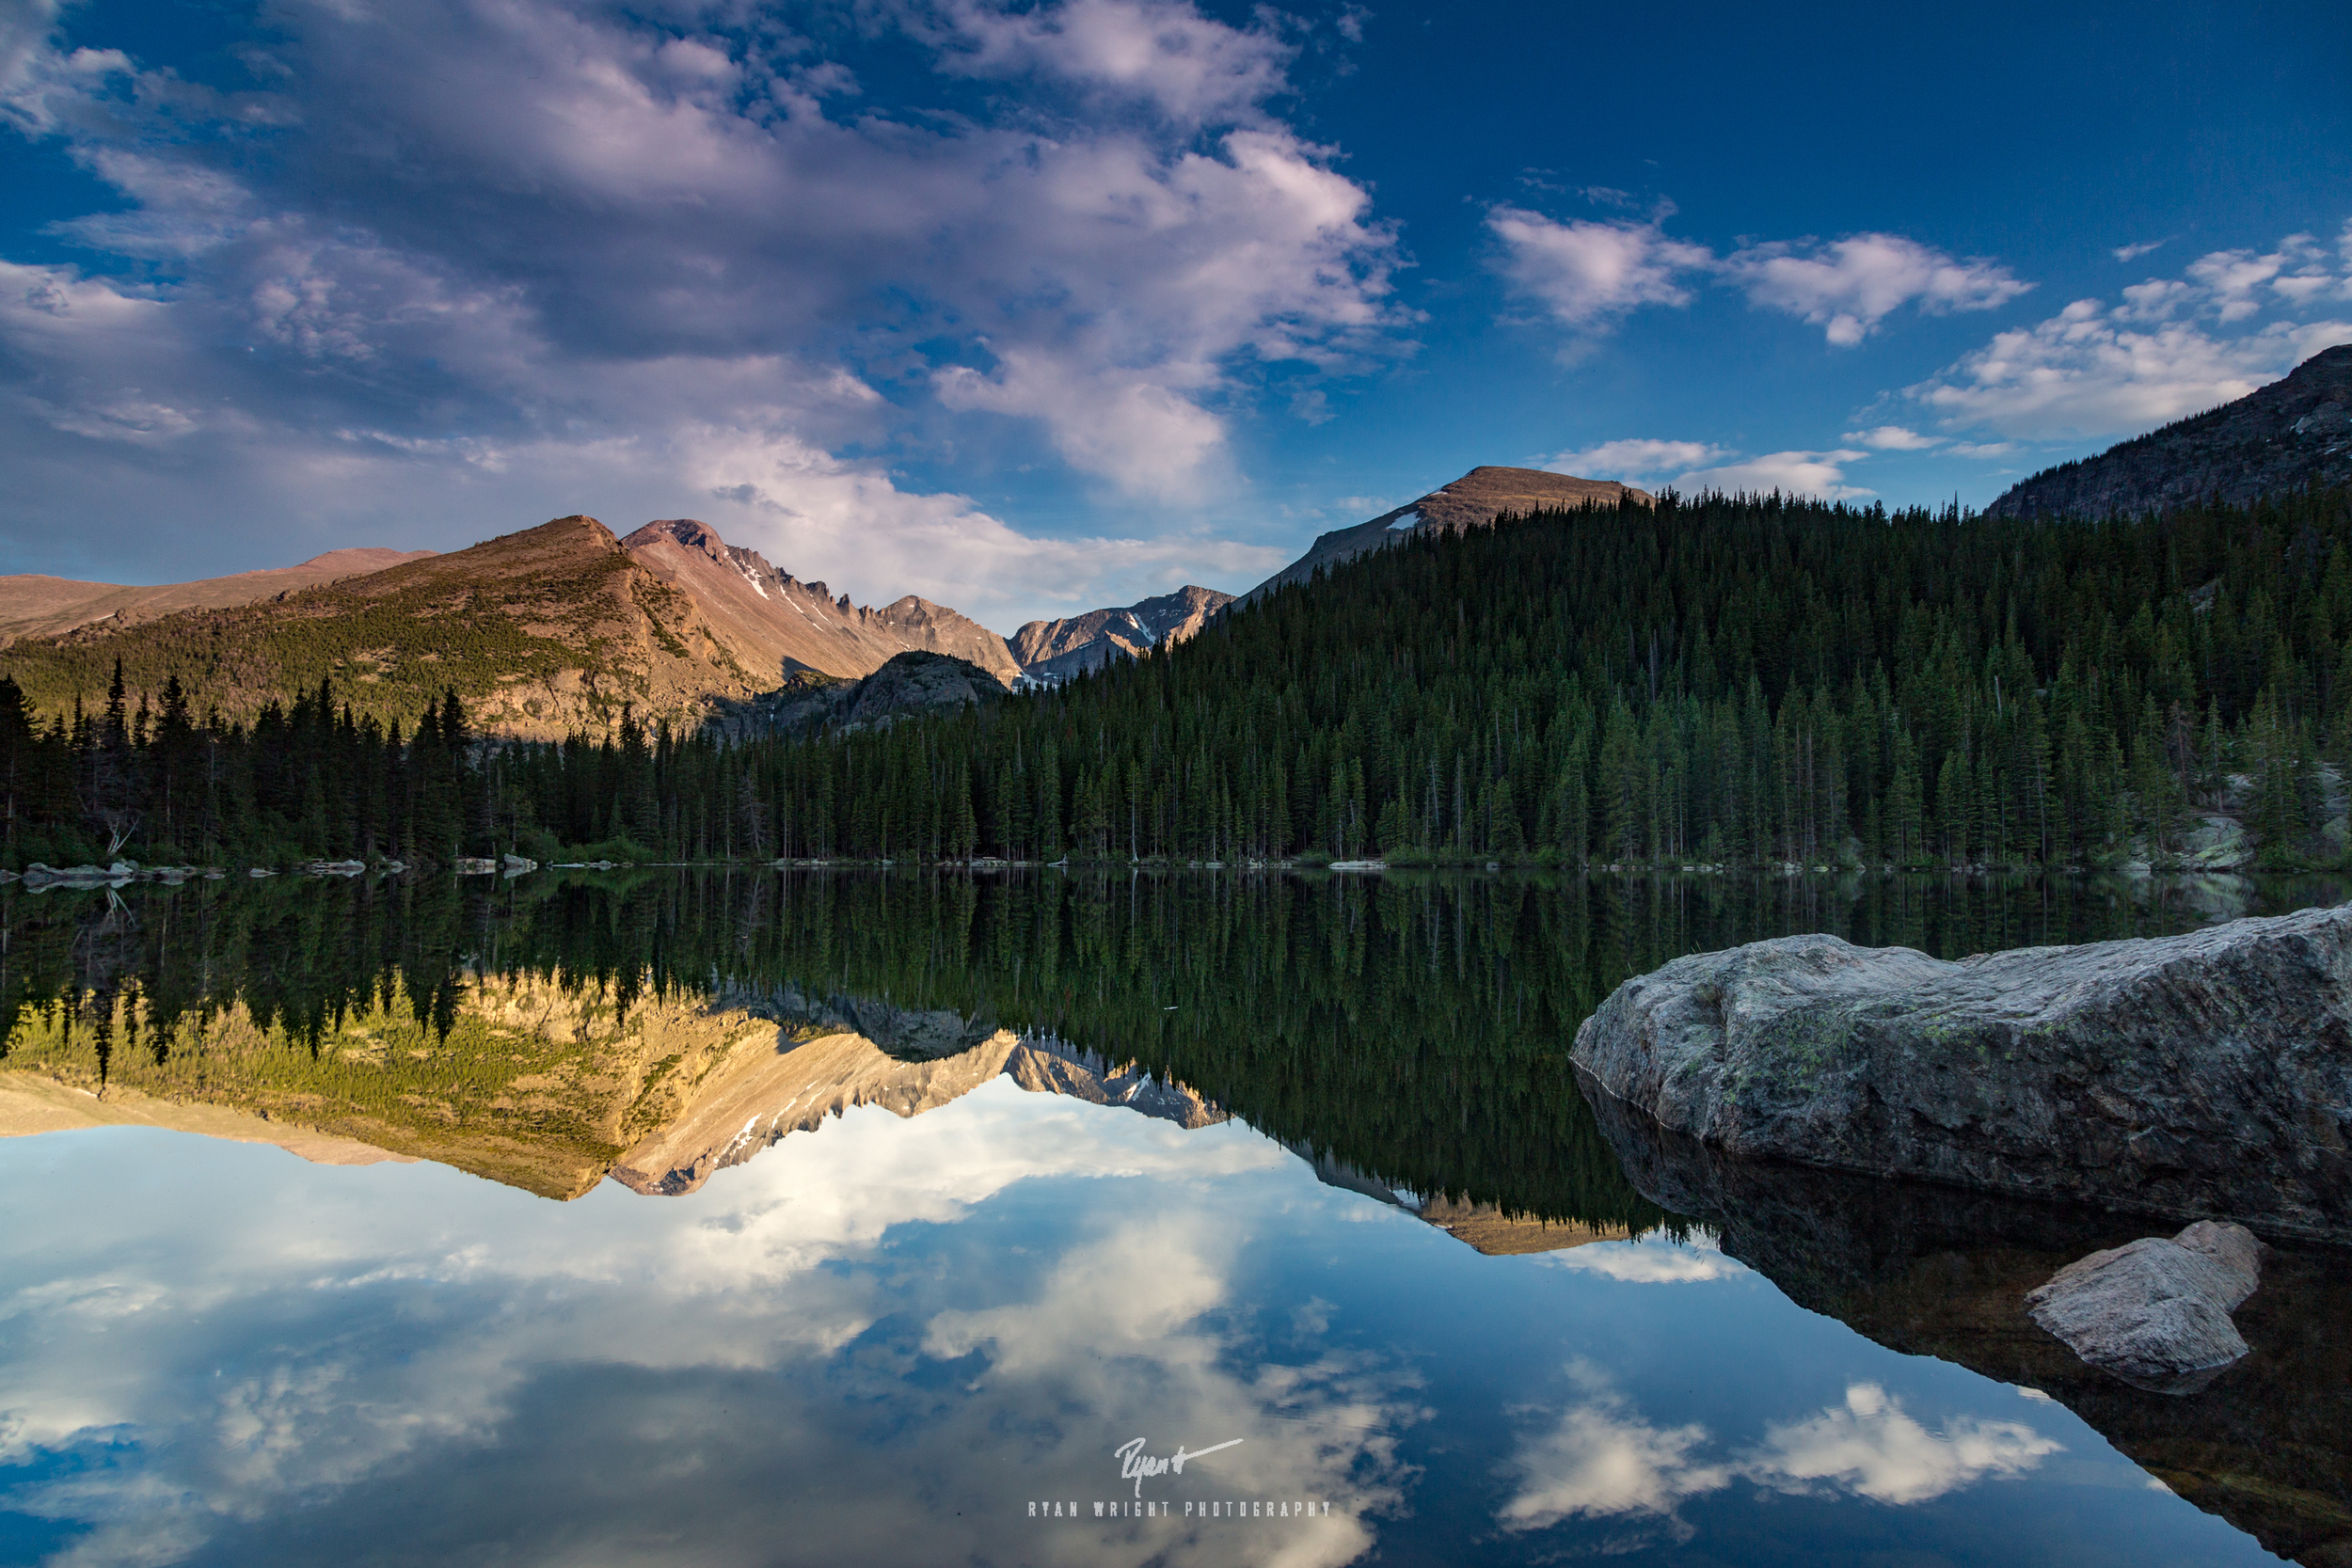 bear-lake-rocky-mountain-national-park.jpg